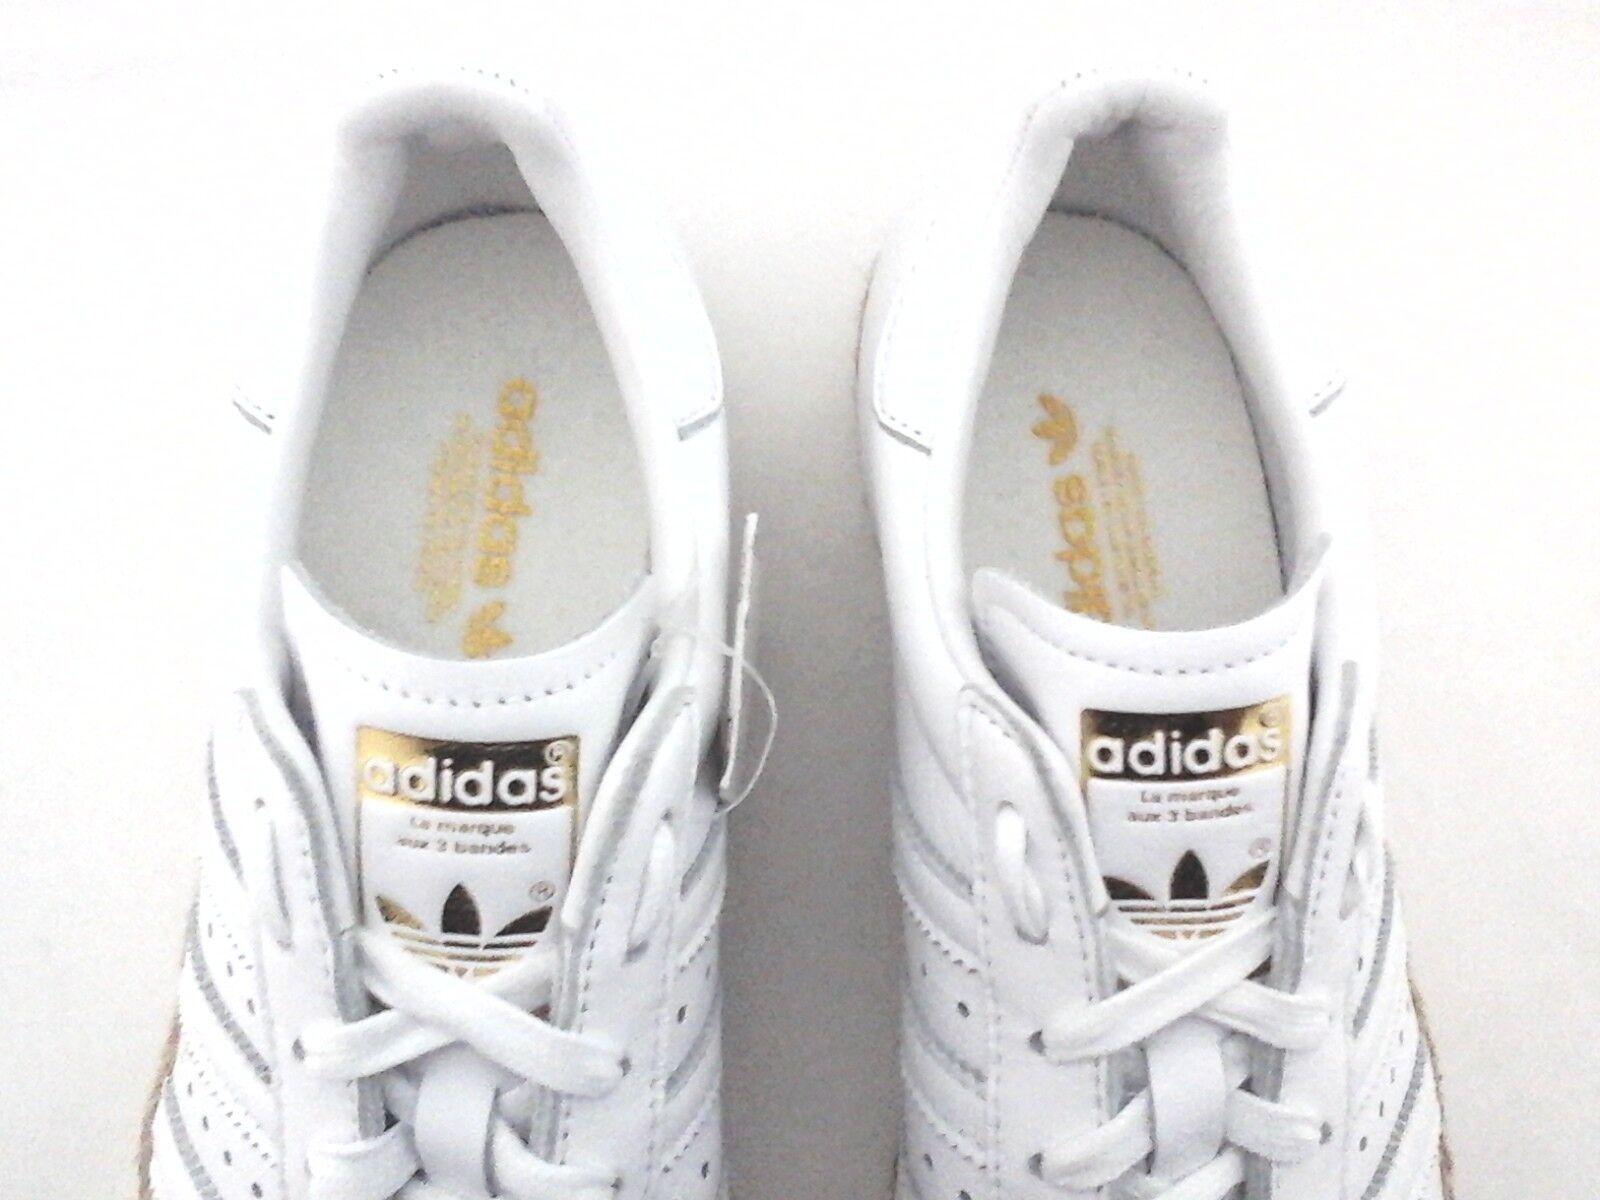 ADIDAS Superstar shoes Bold Espadrilles White DA9573 DA9573 DA9573 Women's US 8 New 631220